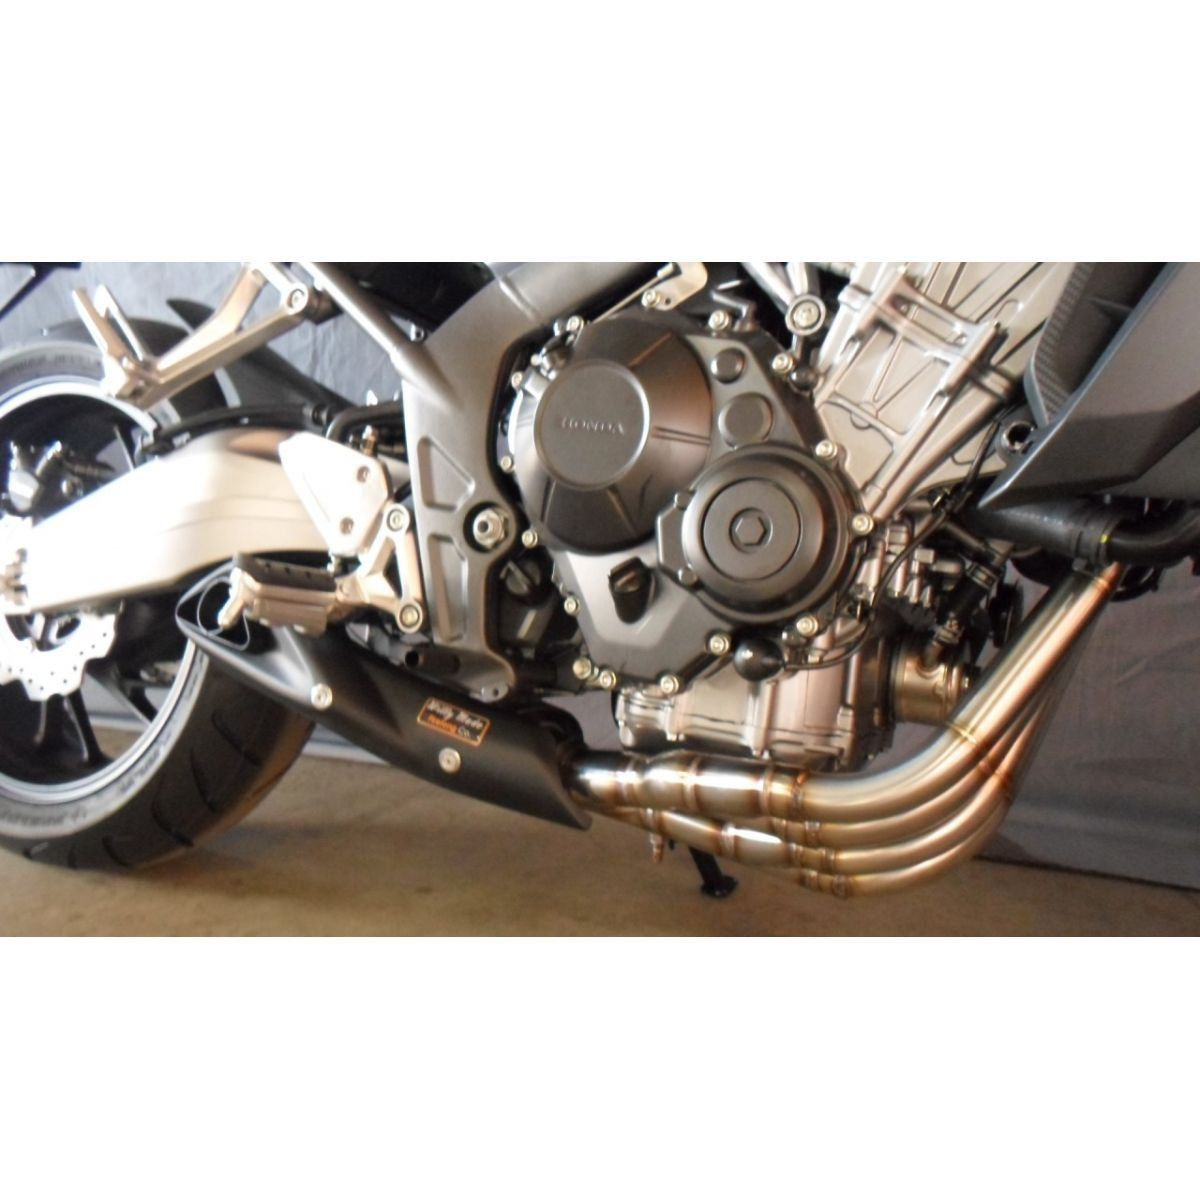 Escapamento Esportivo CB 650F 15/17 Willy Made Firetong  - Motorshopp